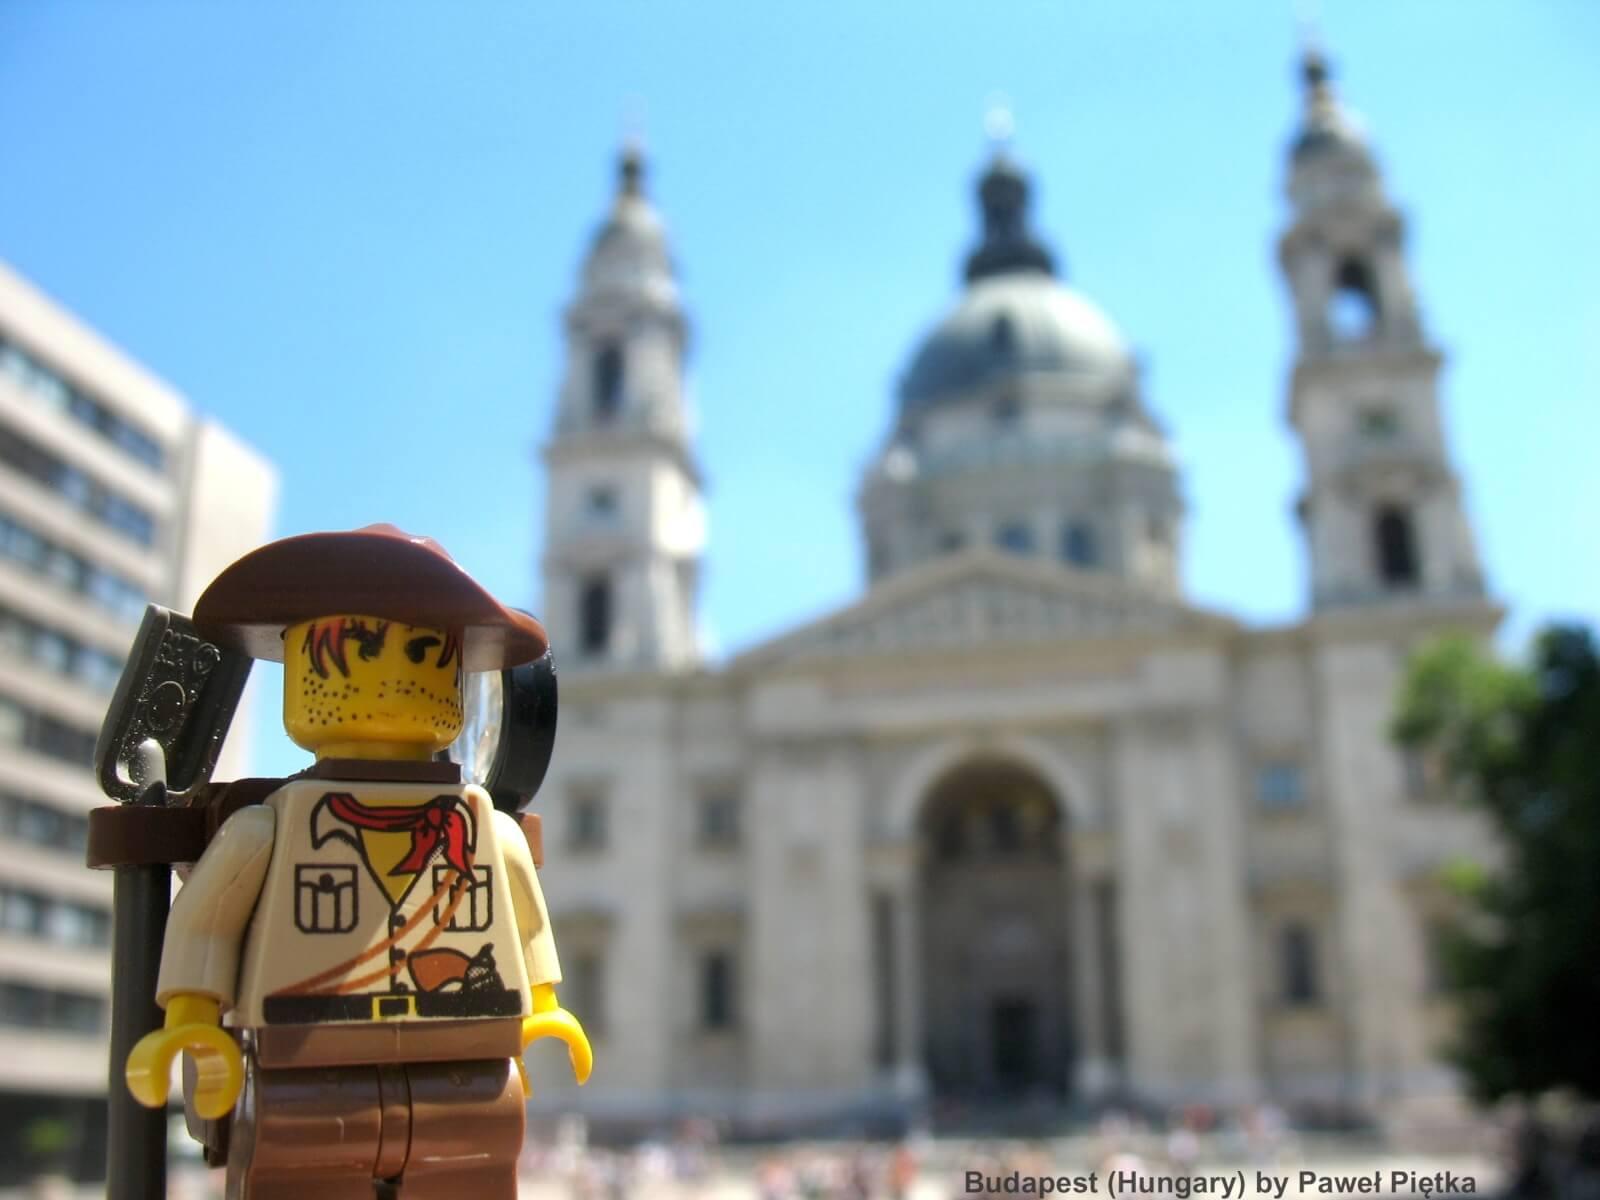 Budapest (Hungary) - Saint Stephen's Basilica